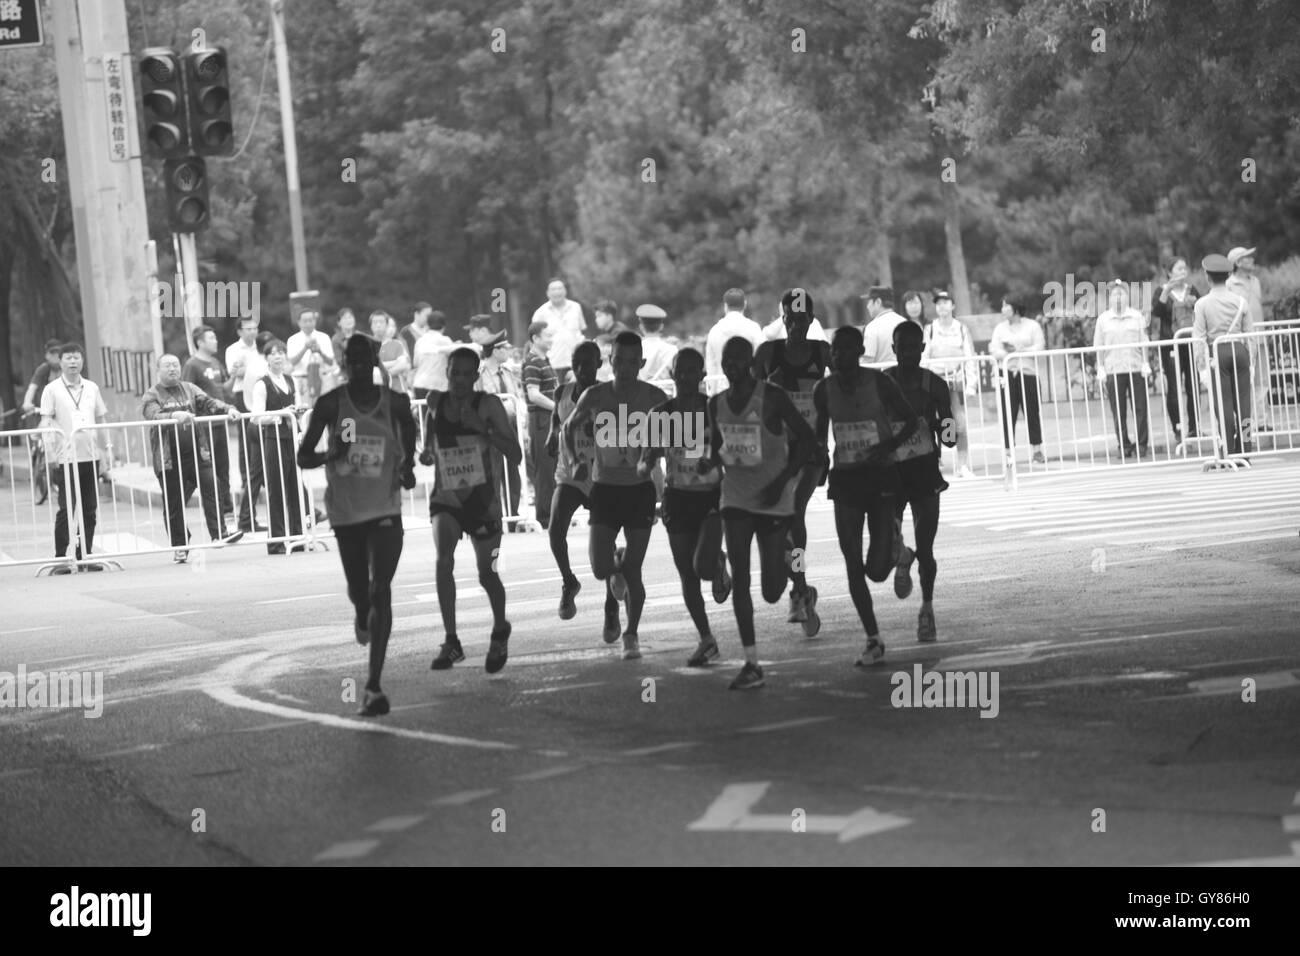 Beijing, Beijing, China. 17th Sep, 2016. Participants run at the Beijing Marathon in Beijing on September 17, 2016. - Stock Image